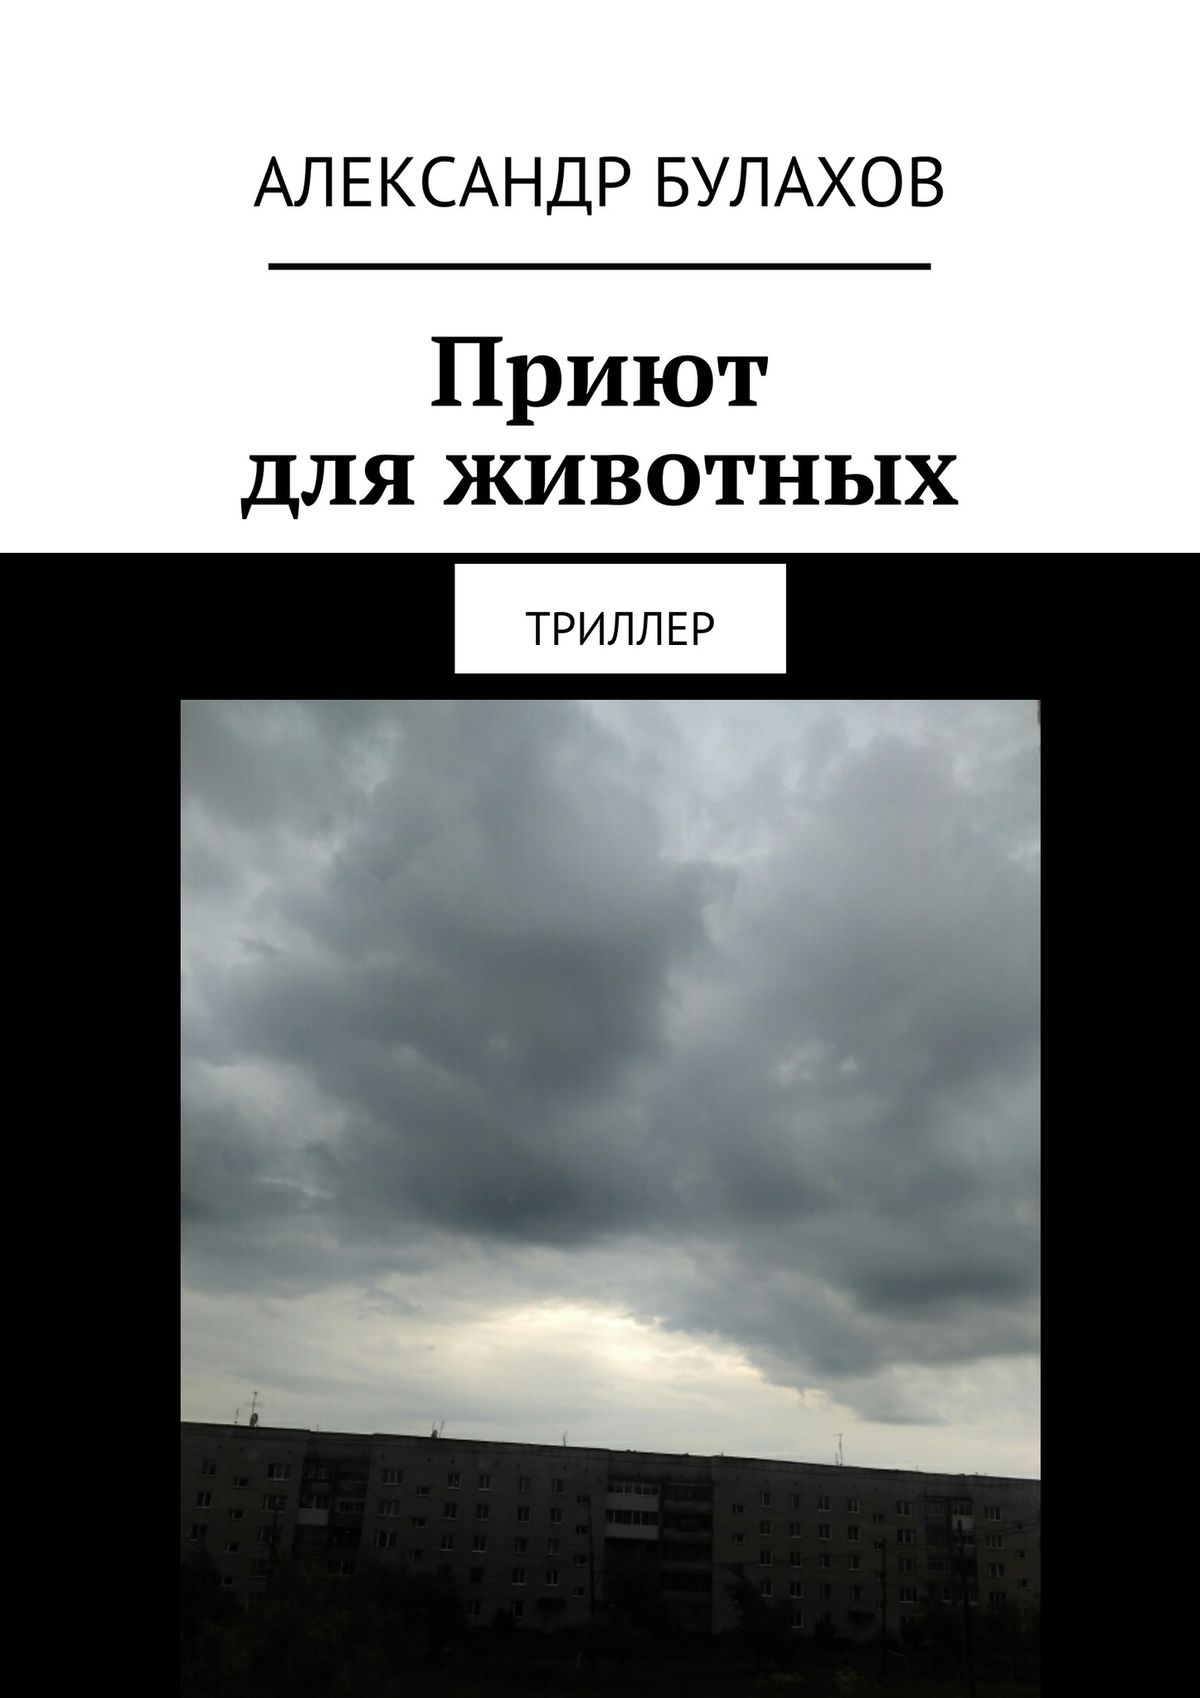 Александр Булахов Приют дляживотных. Триллер александр булахов приют дляживотных триллер